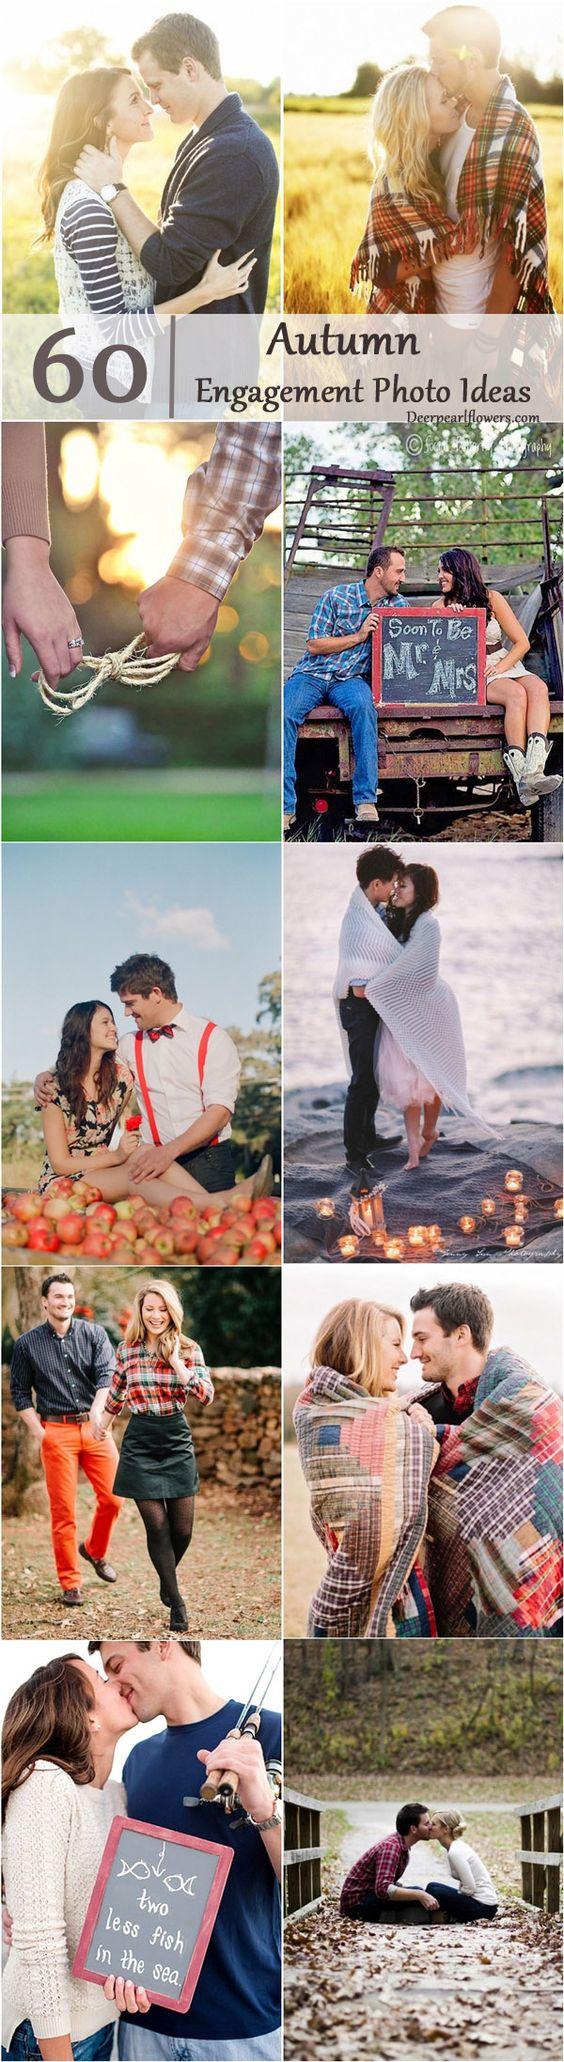 interior design ndsu - Fall engagement, ngagement photos and Photo ideas on Pinterest